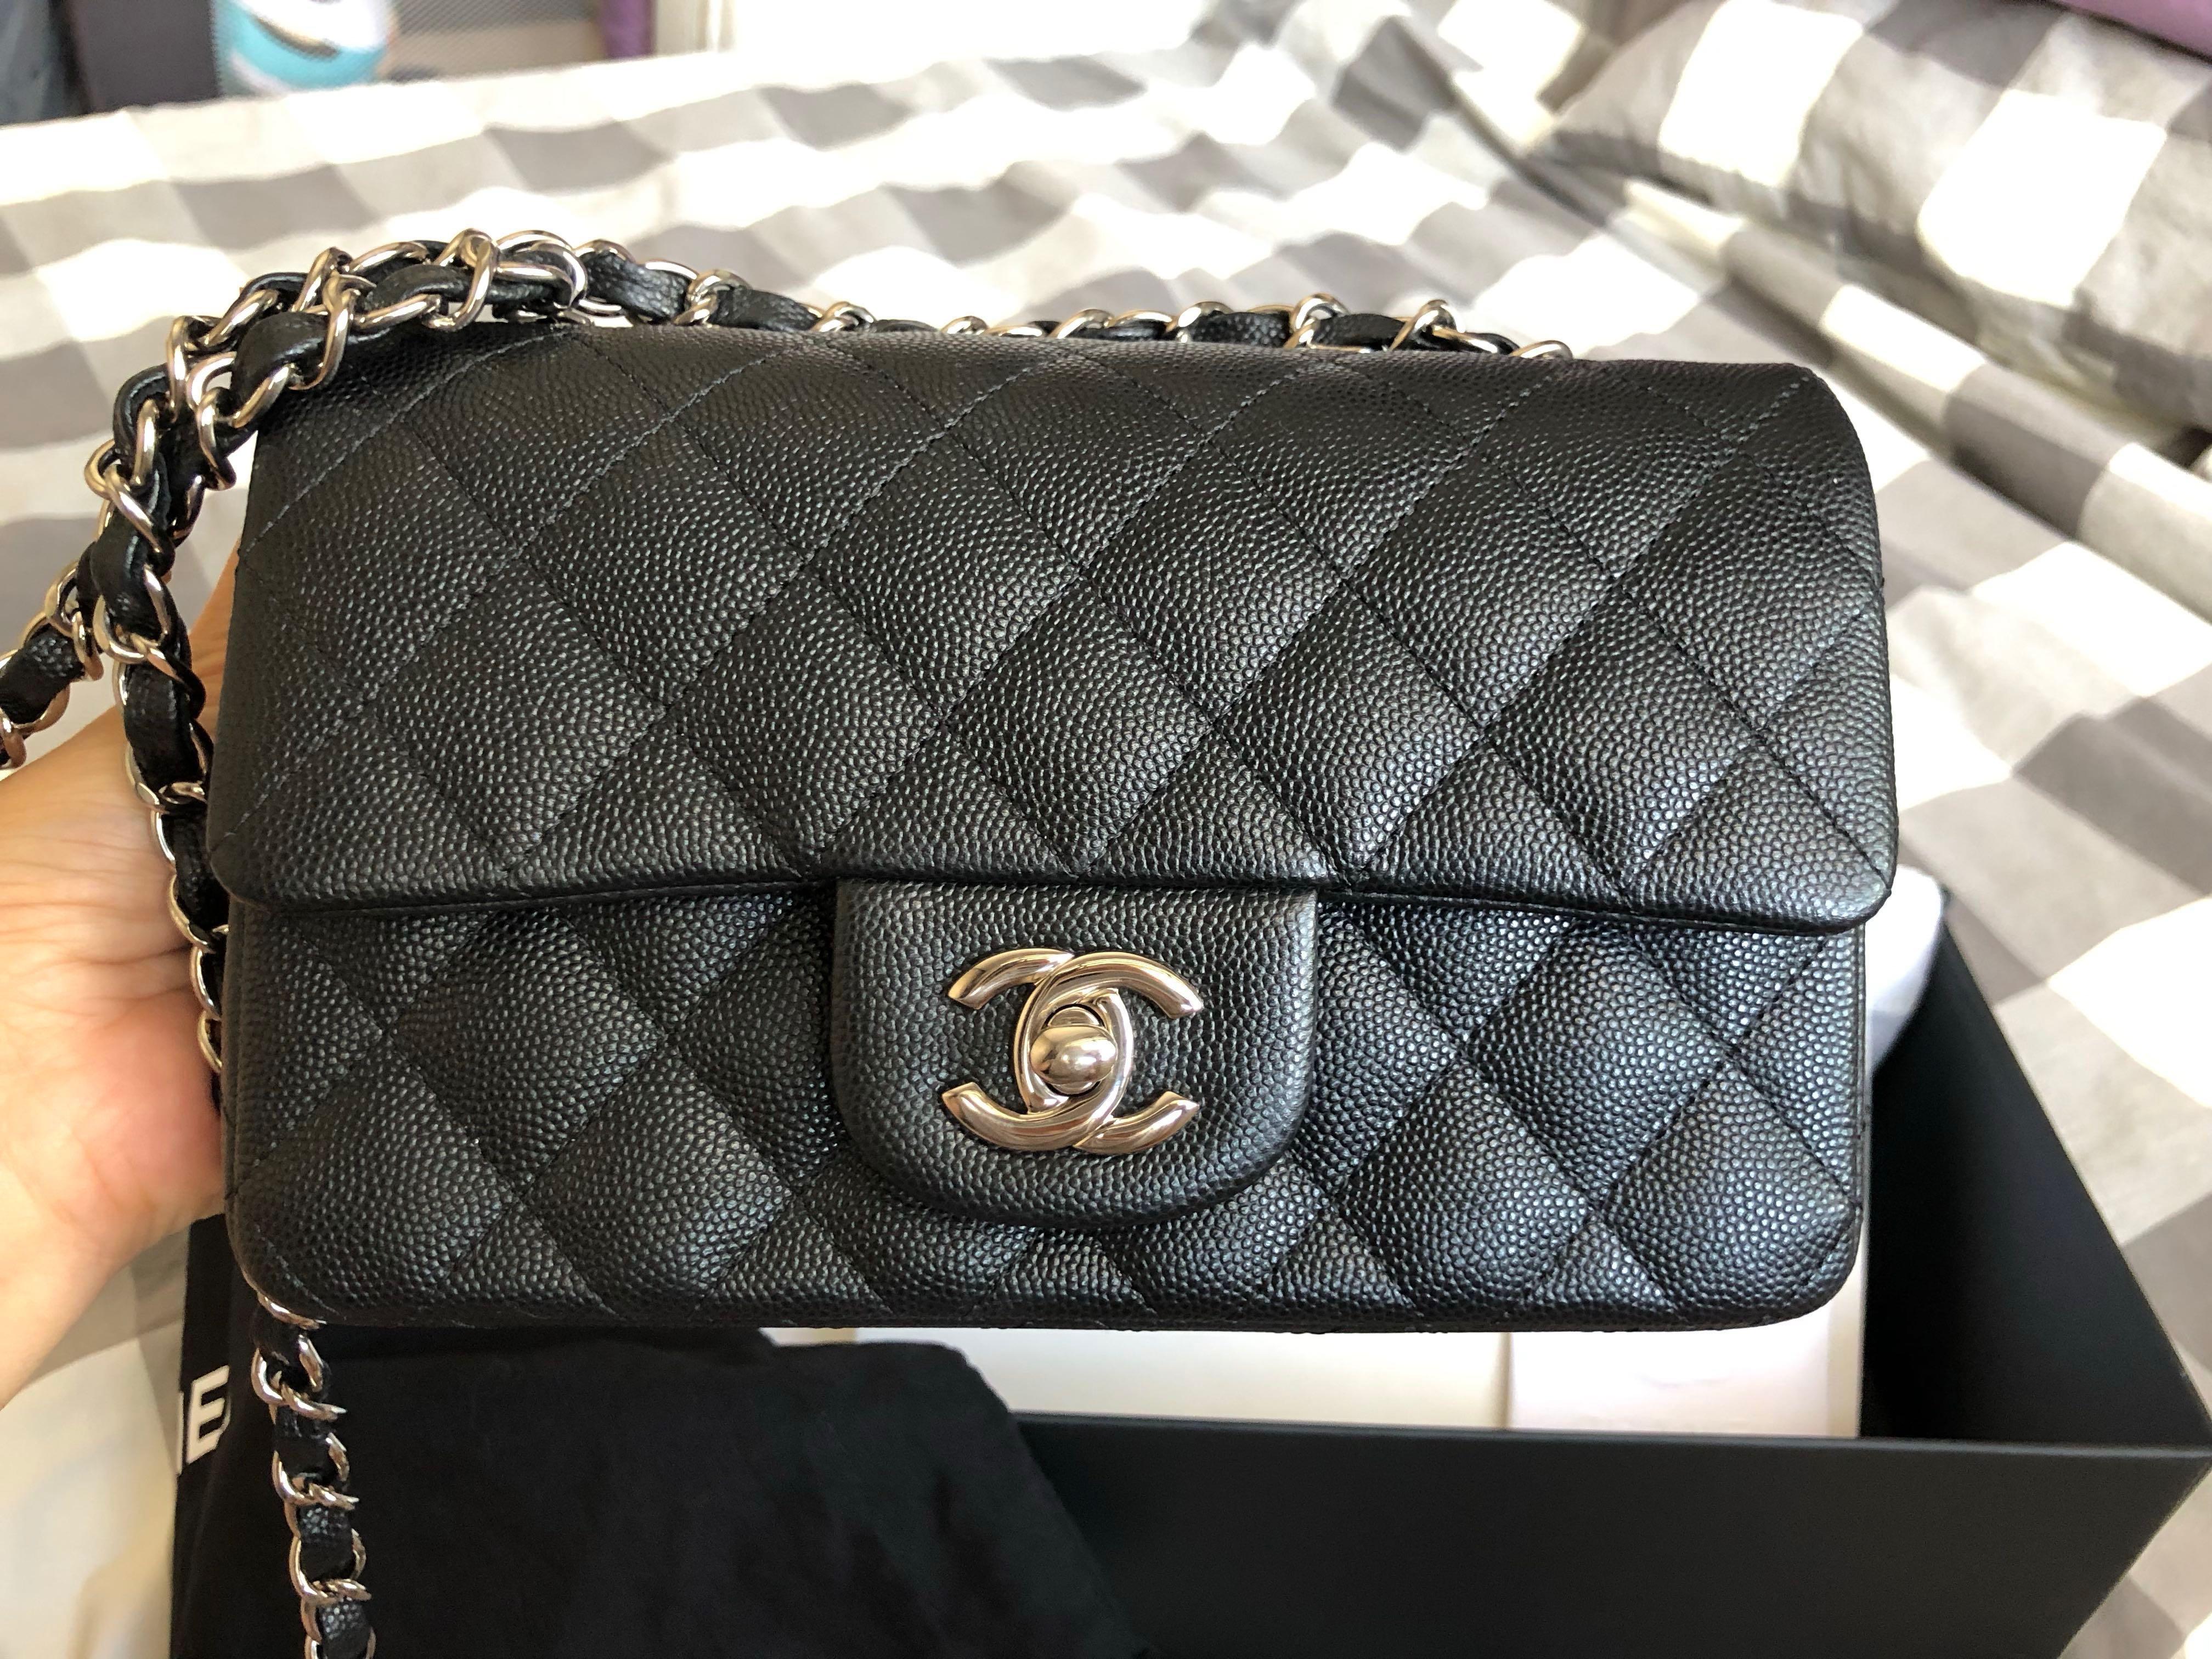 4e62aeadca21a6 LN chanel caviar mini rectangular black SHW , Luxury, Bags & Wallets,  Handbags on Carousell